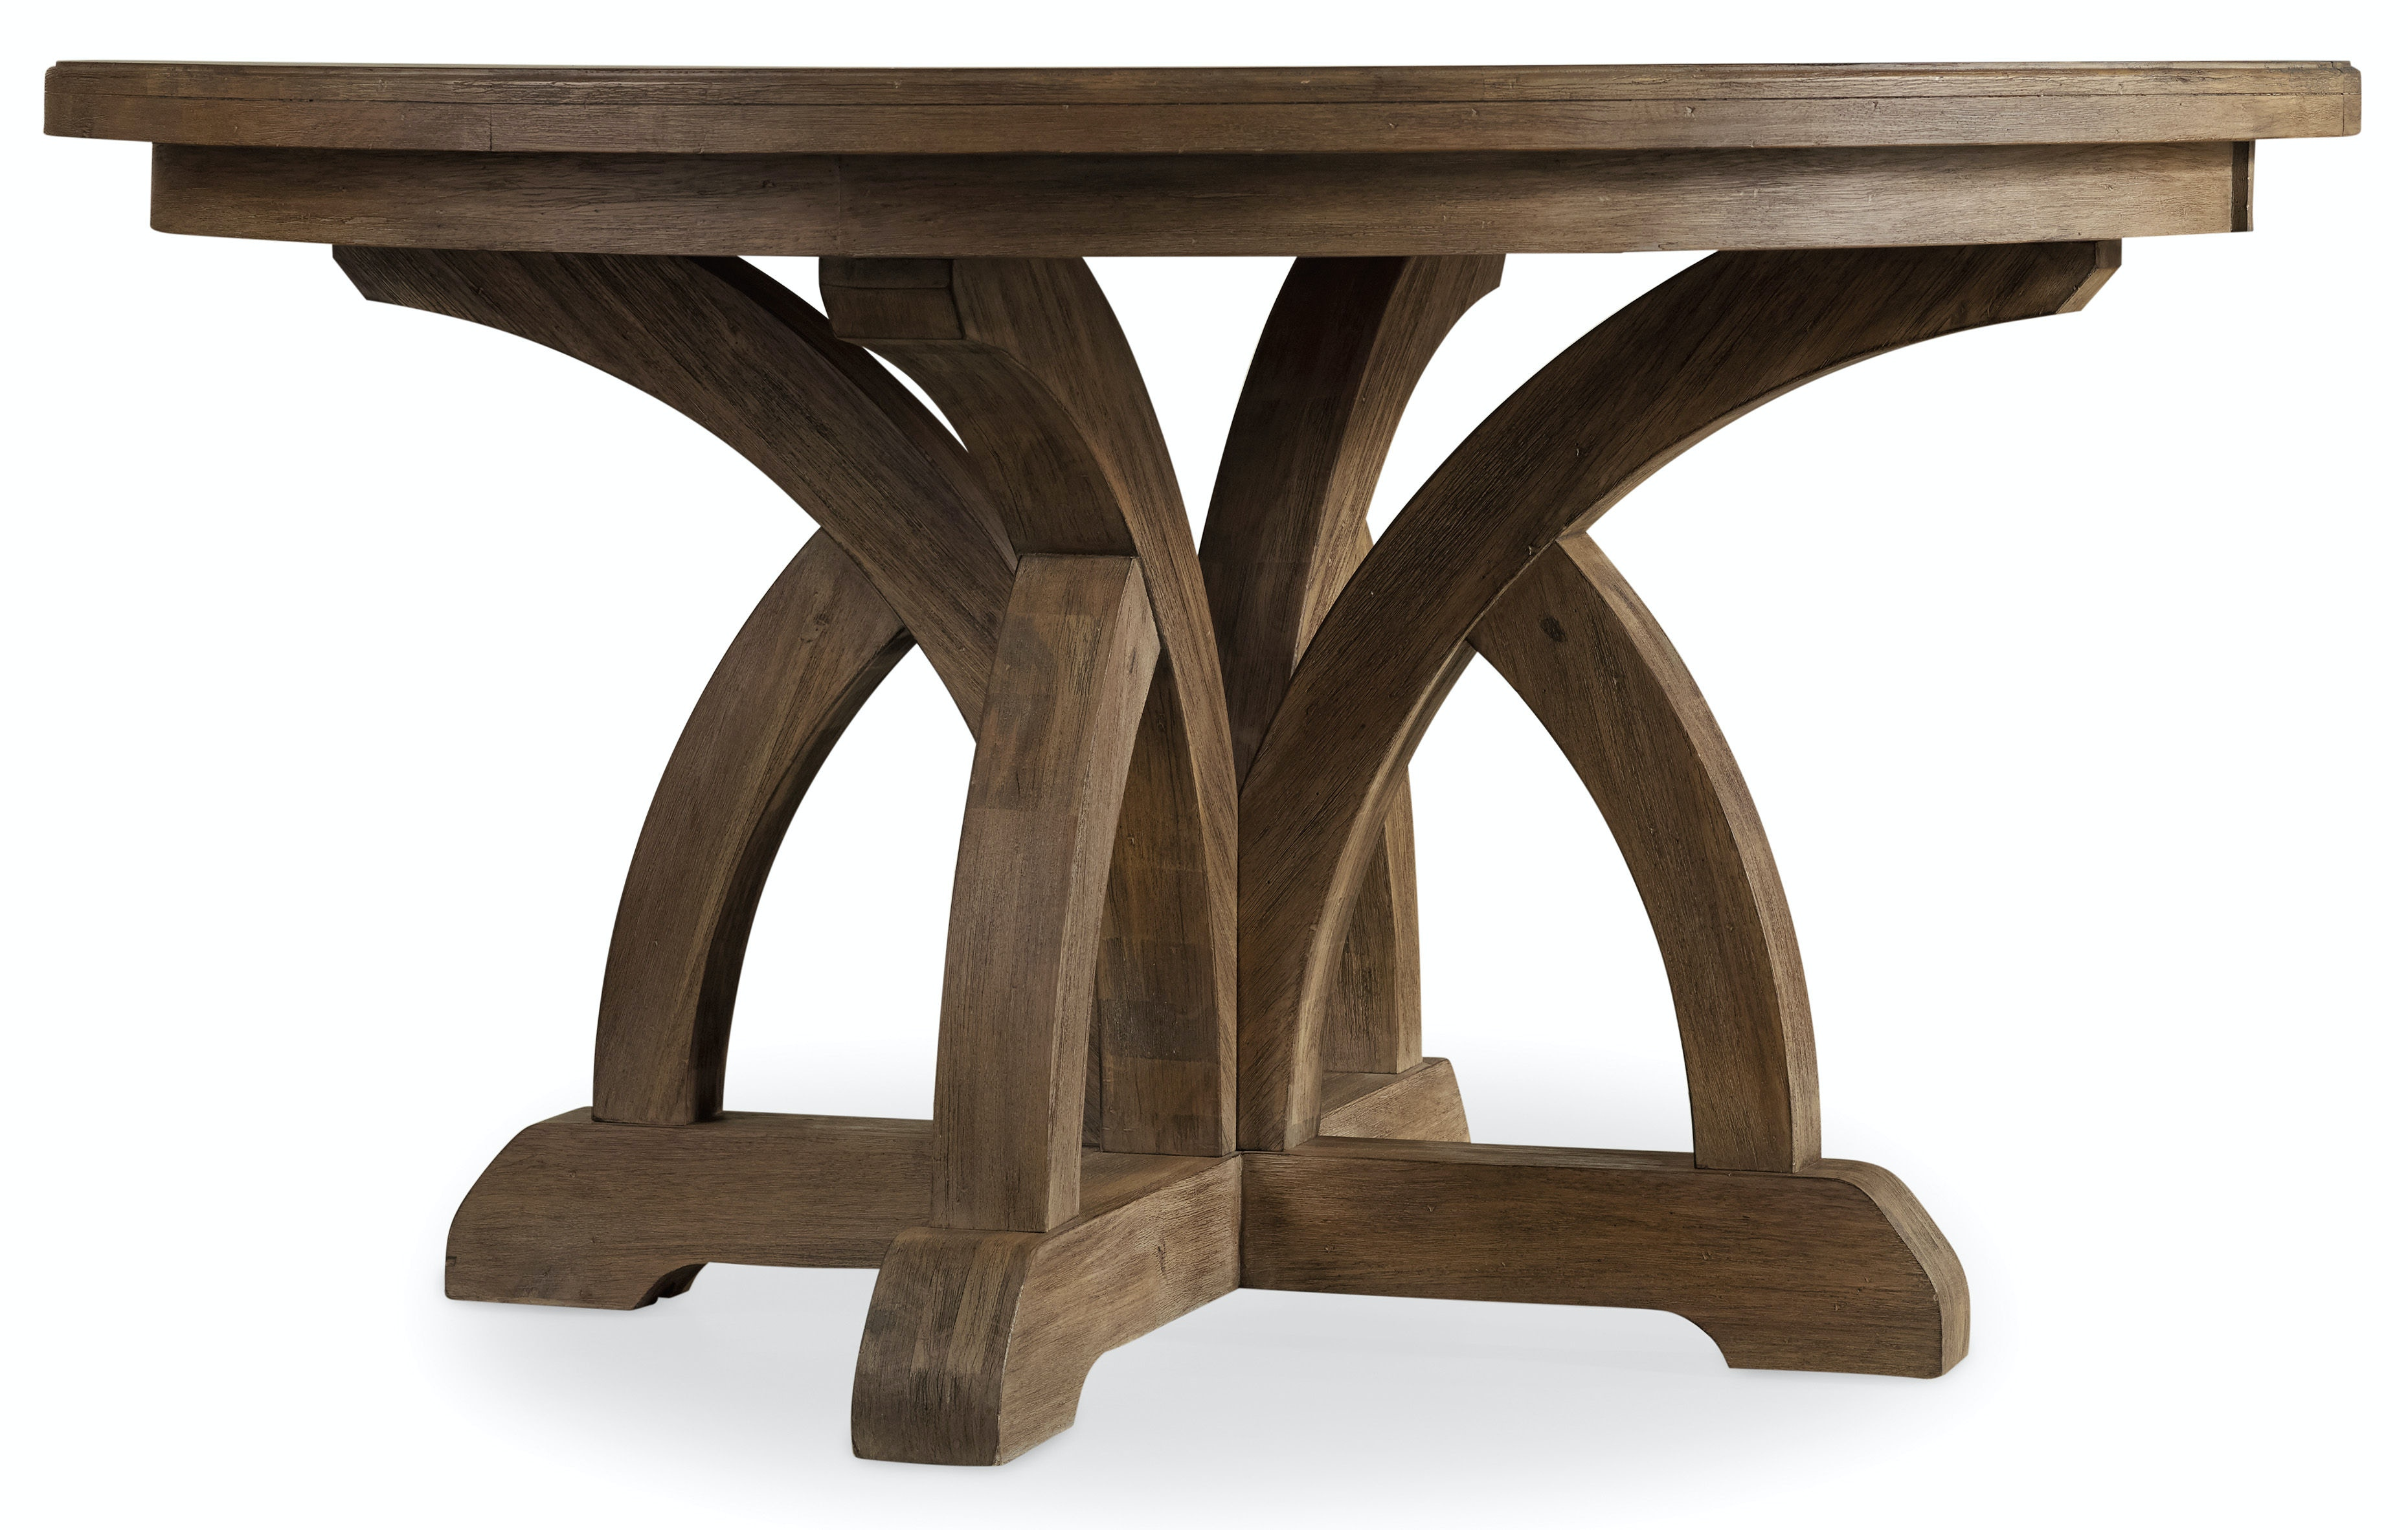 hooker furniture dining room corsica round dining table w 1 18in leaf 5180 75203. Black Bedroom Furniture Sets. Home Design Ideas